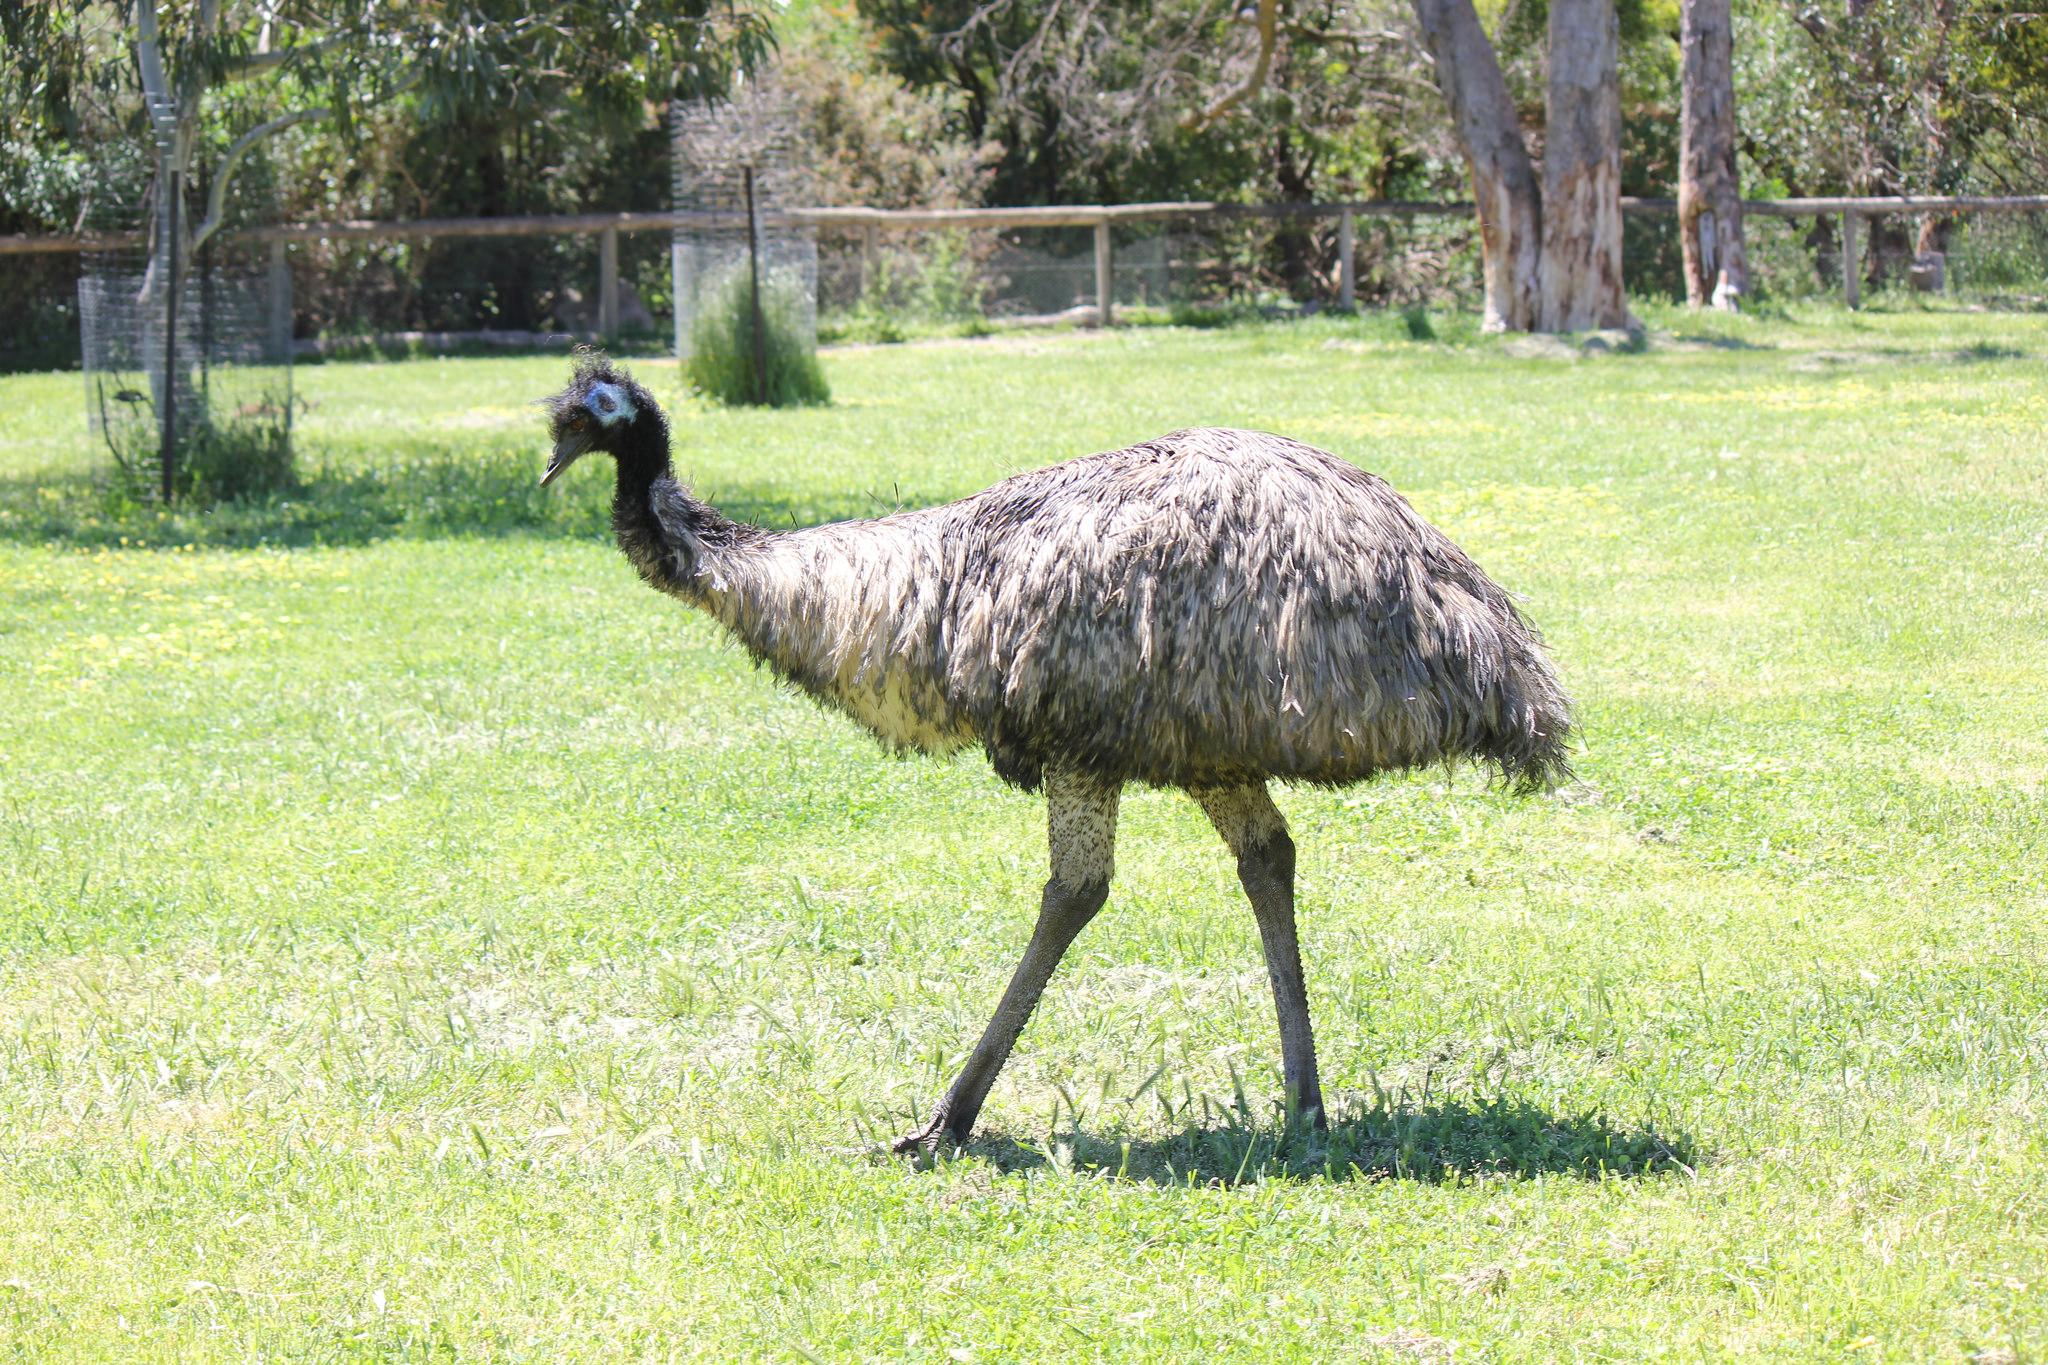 Описание и характеристика страуса Эму